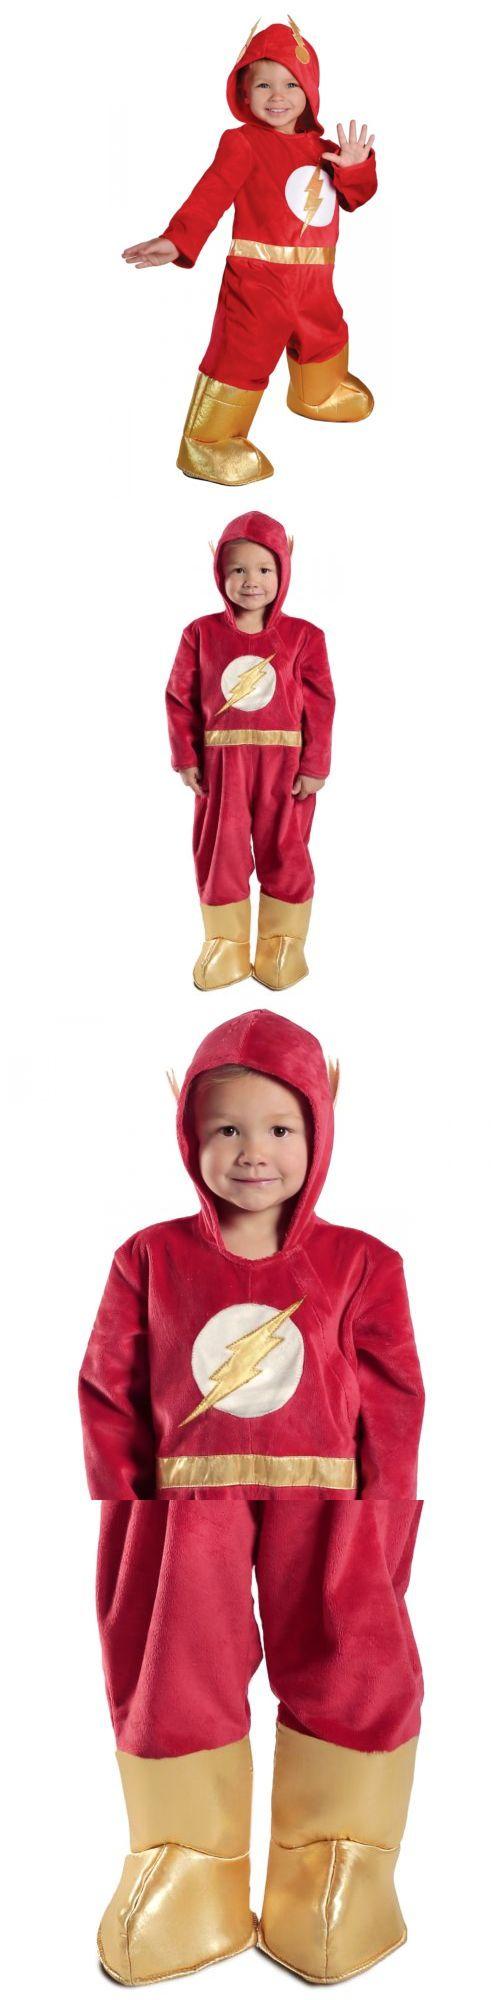 Halloween Costumes Kids: The Flash Costume Toddler Baby Superhero Halloween Fancy Dress BUY IT NOW ONLY: $31.19